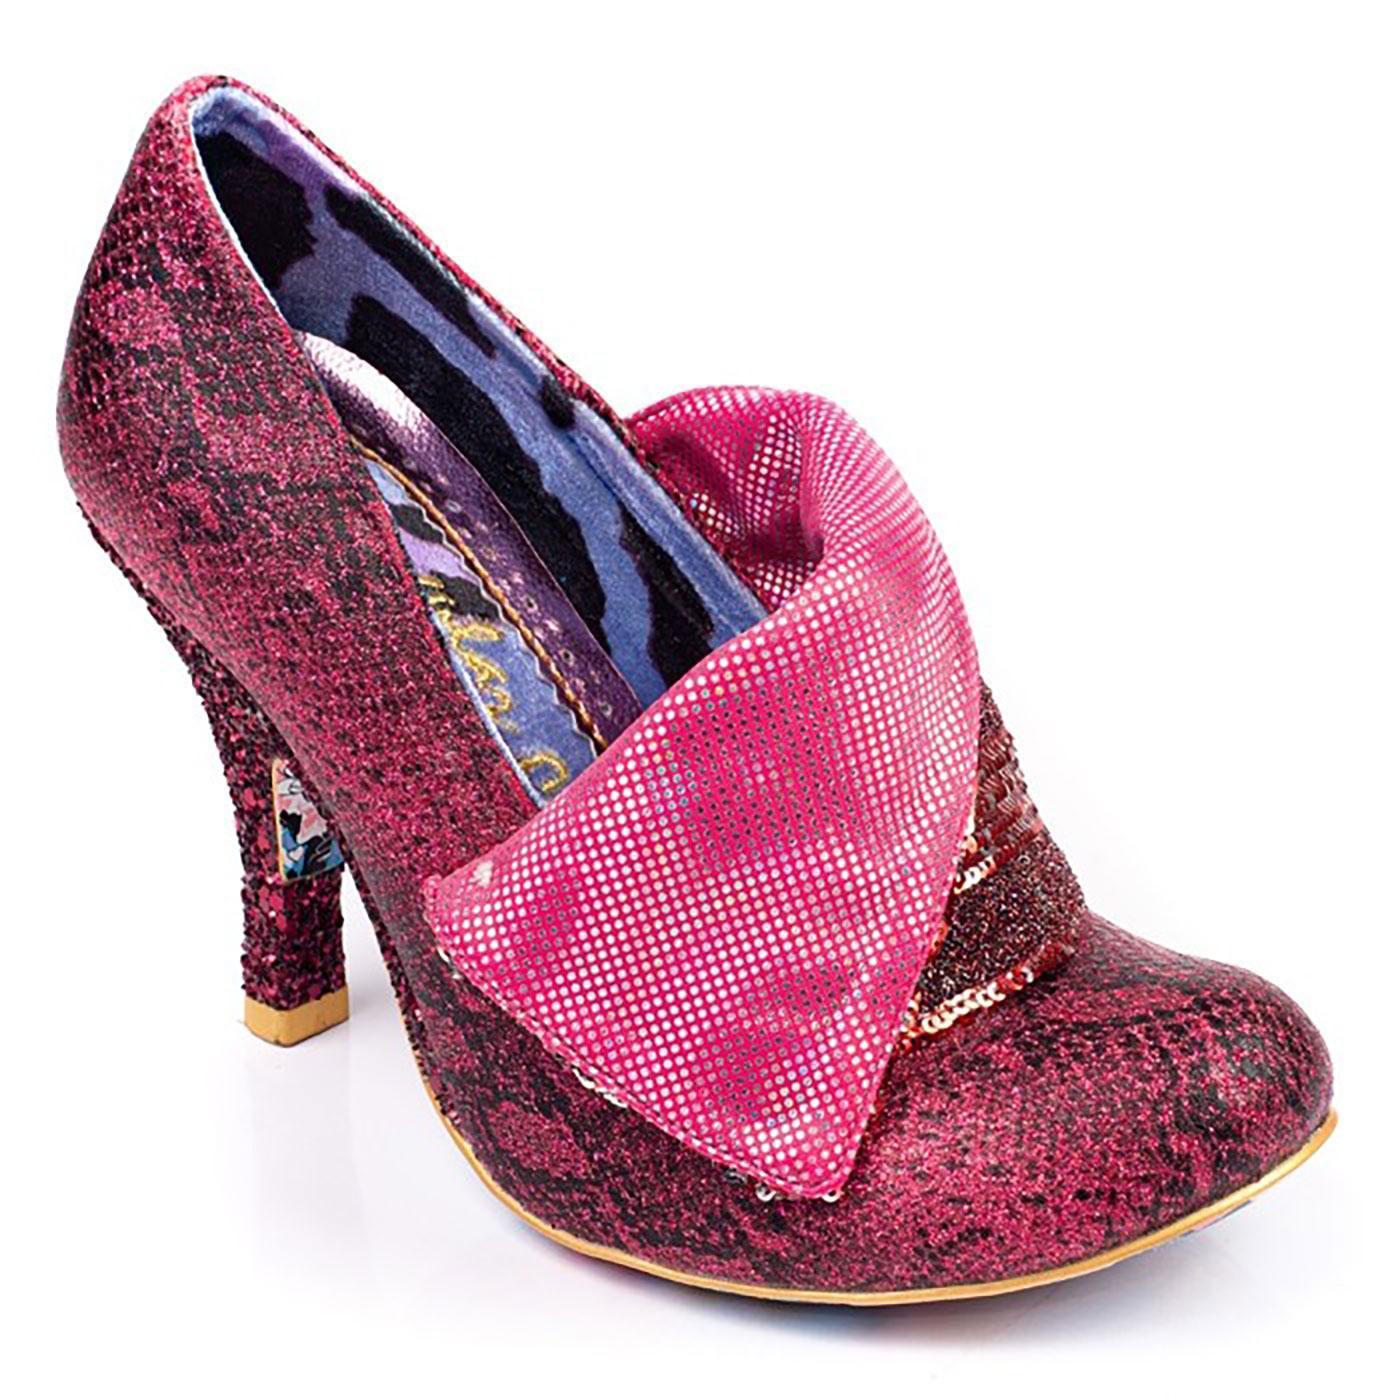 Flick Flack IRREGULAR CHOICE Metallic Heels Pink